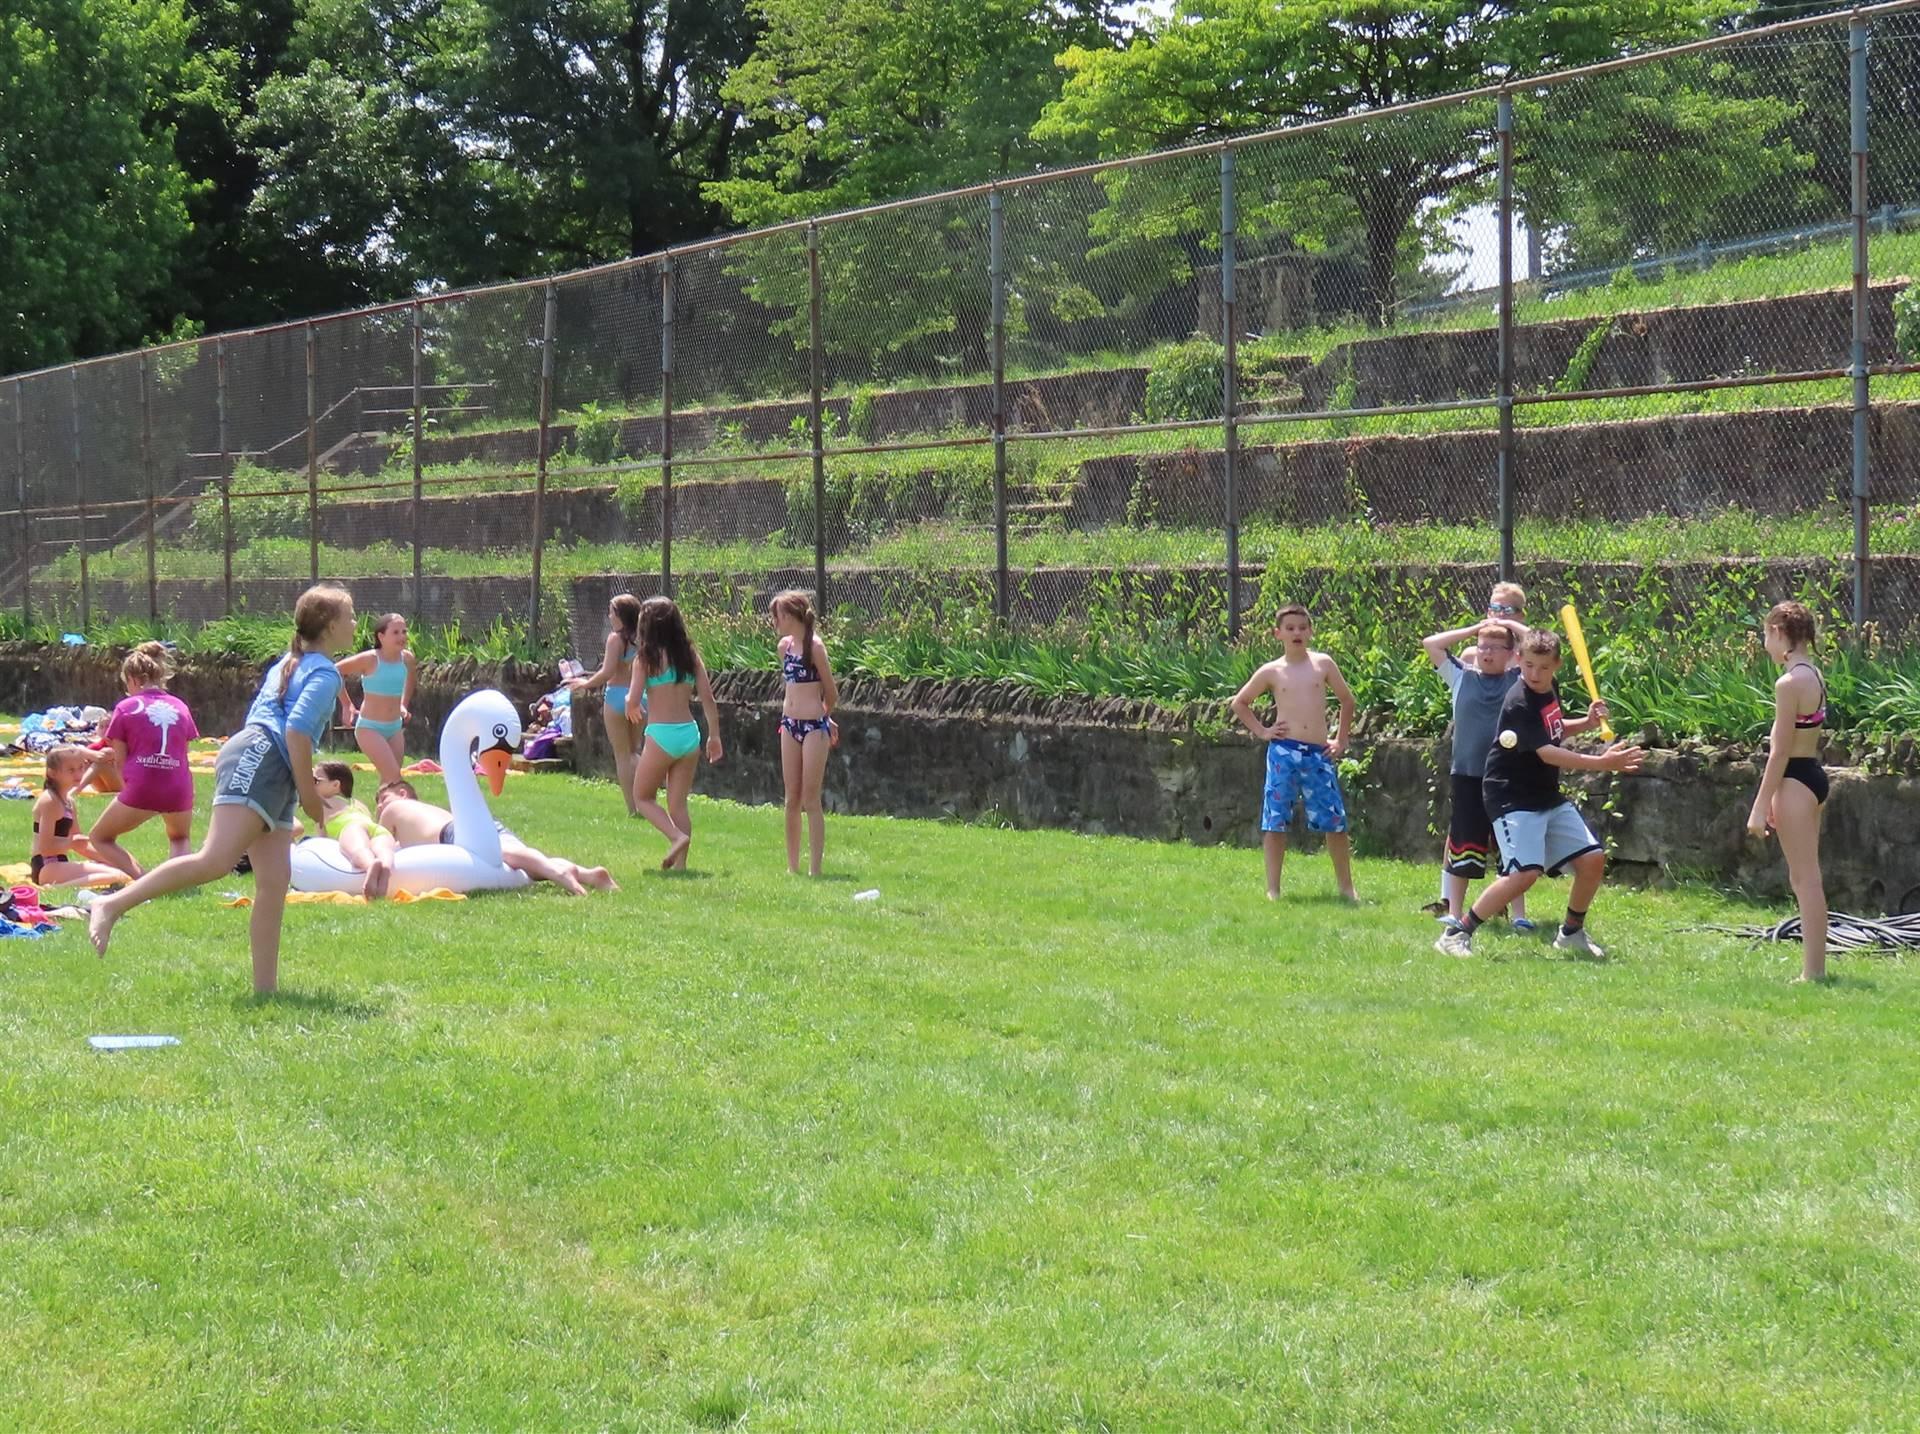 Kids playing whiffle ball